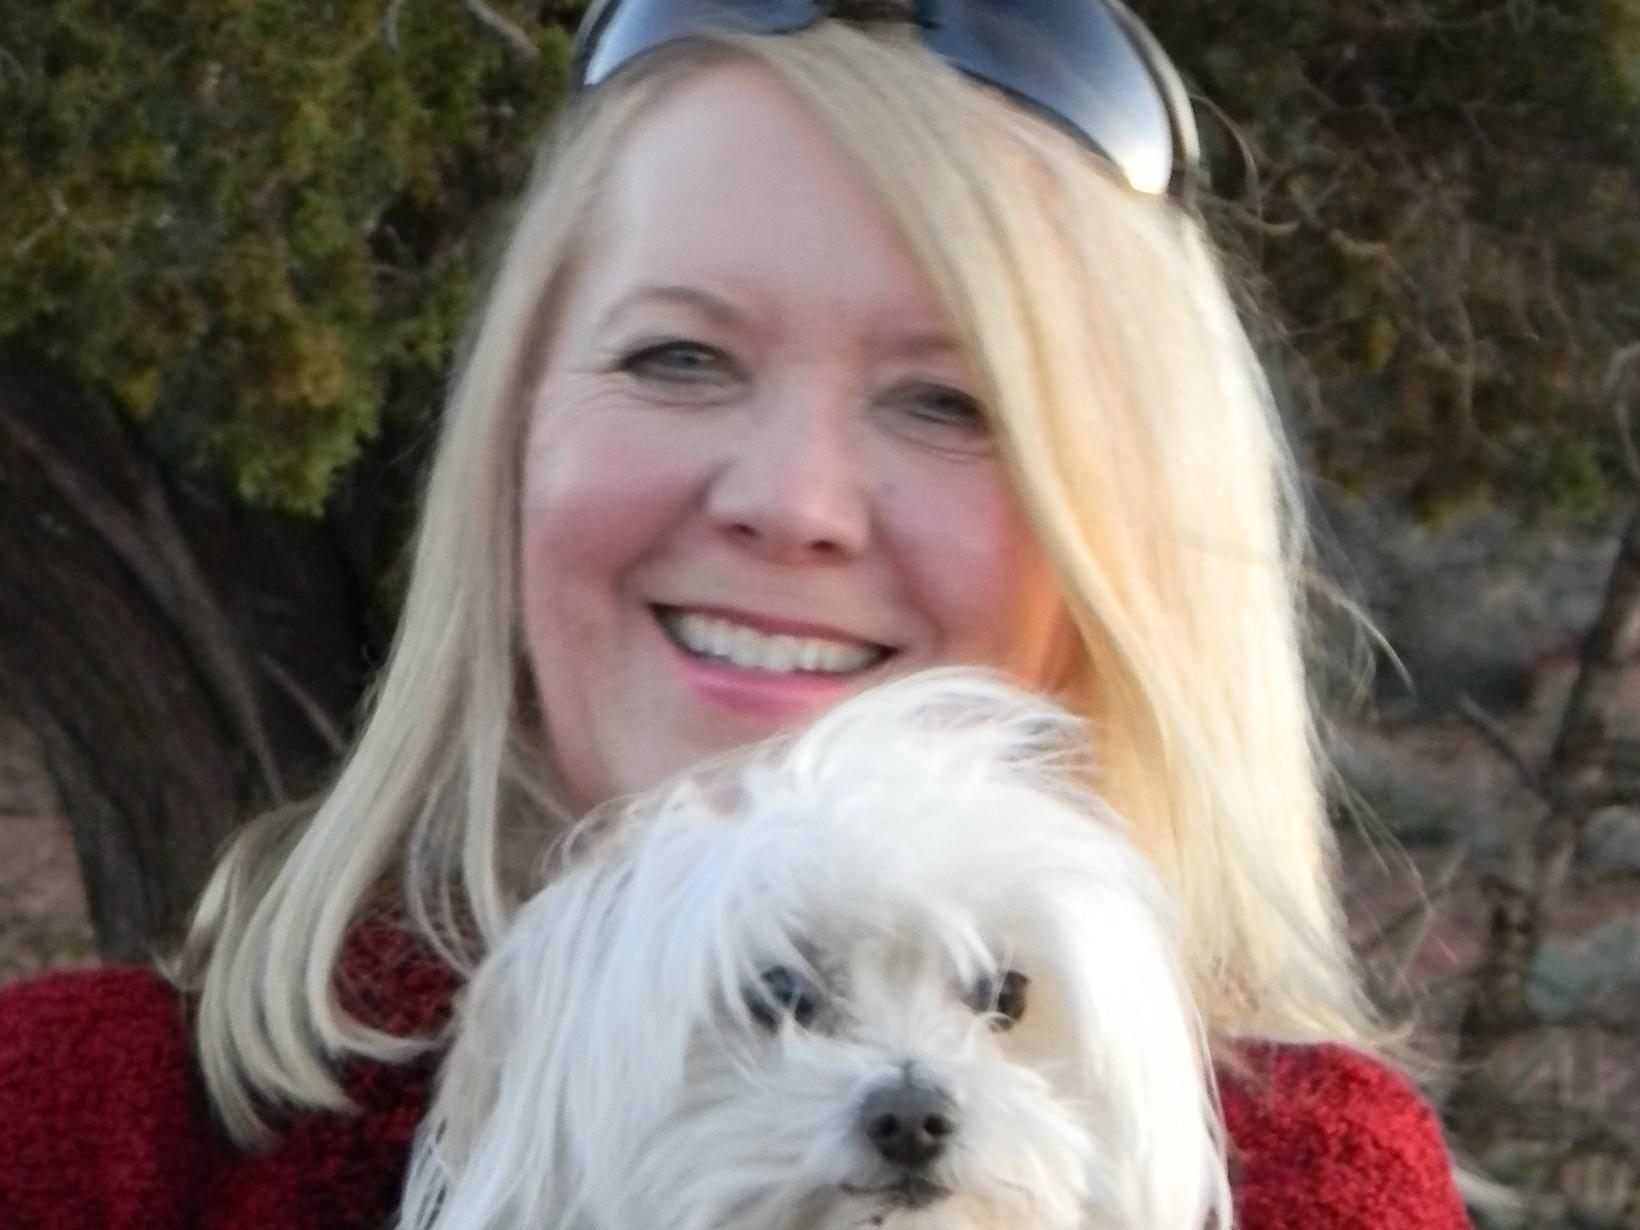 Terri from Pasadena, California, United States